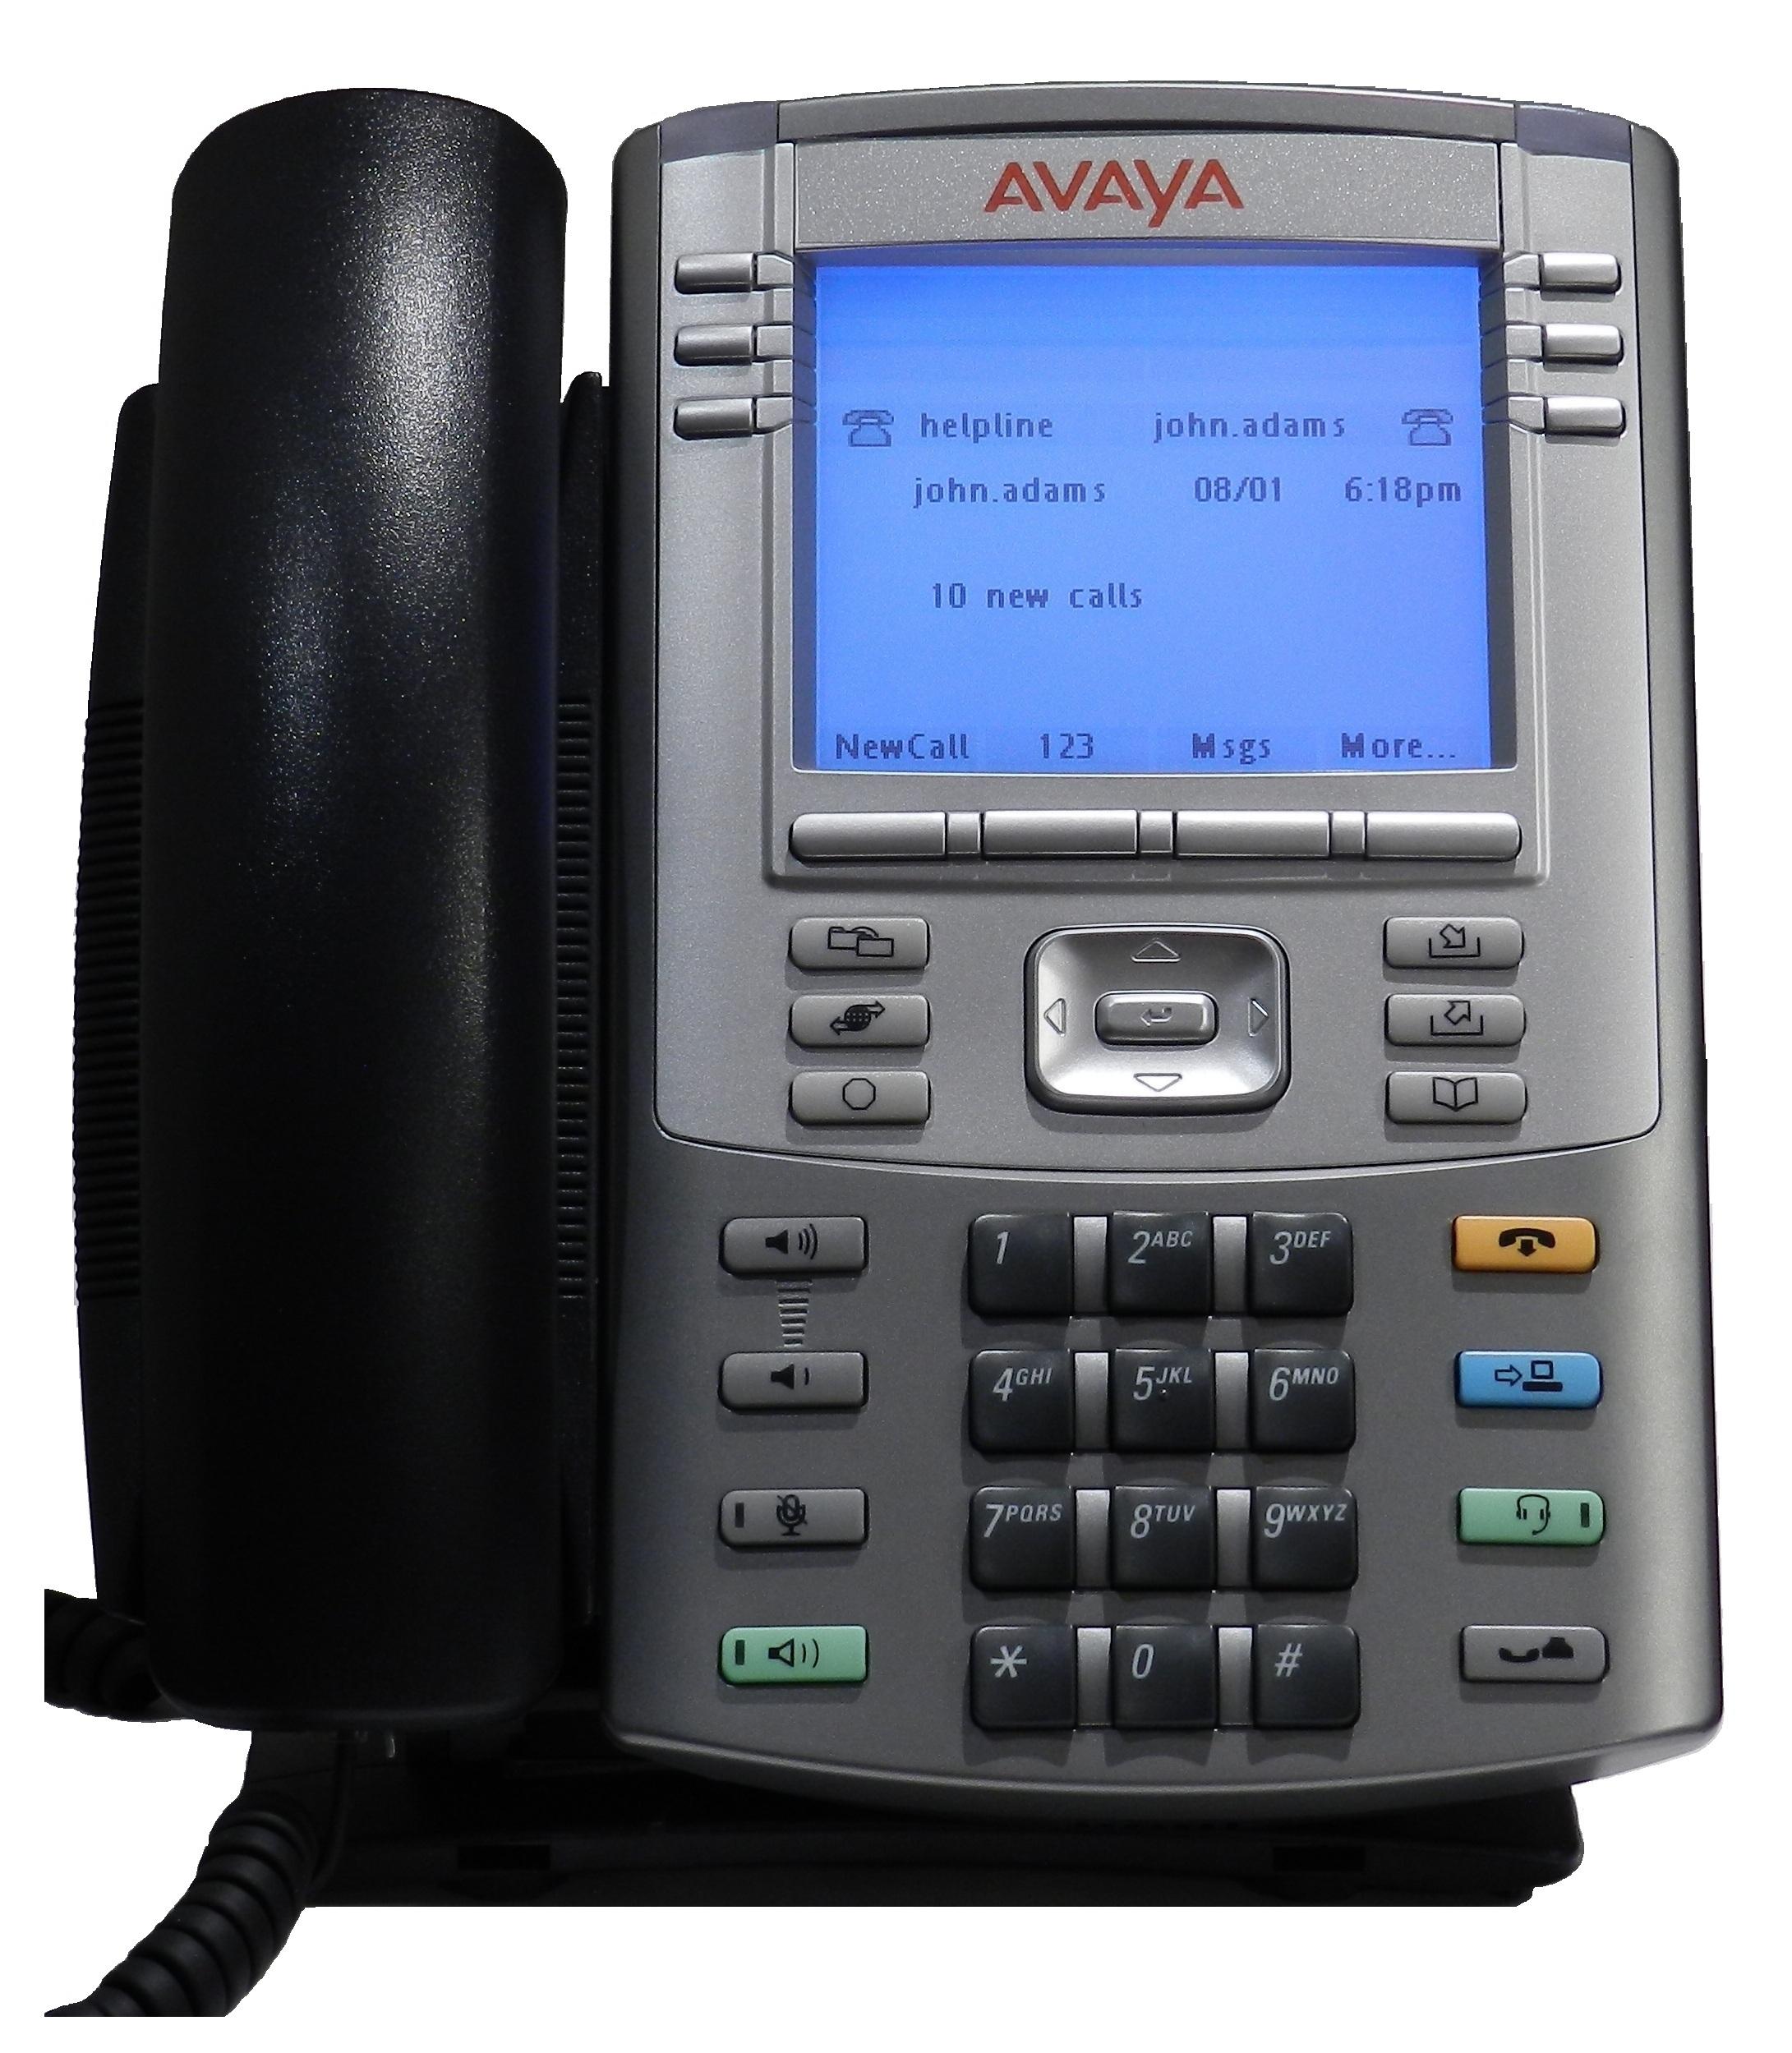 Avaya Phone by Wikipedia user Geek2003